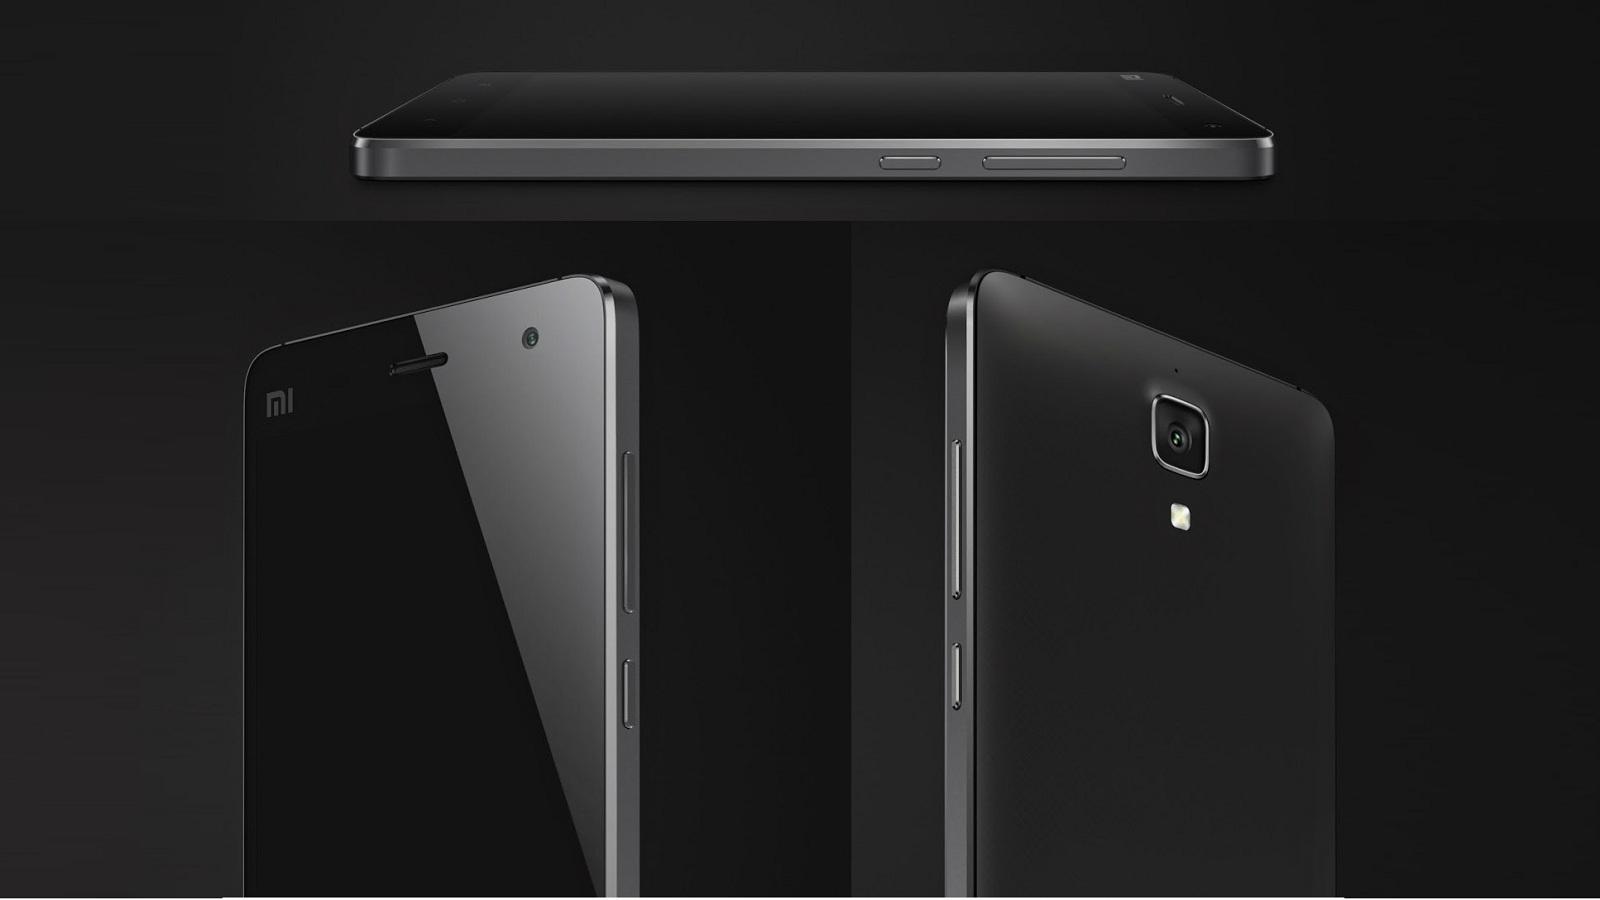 xiaomi-mi4-smartphone-detail